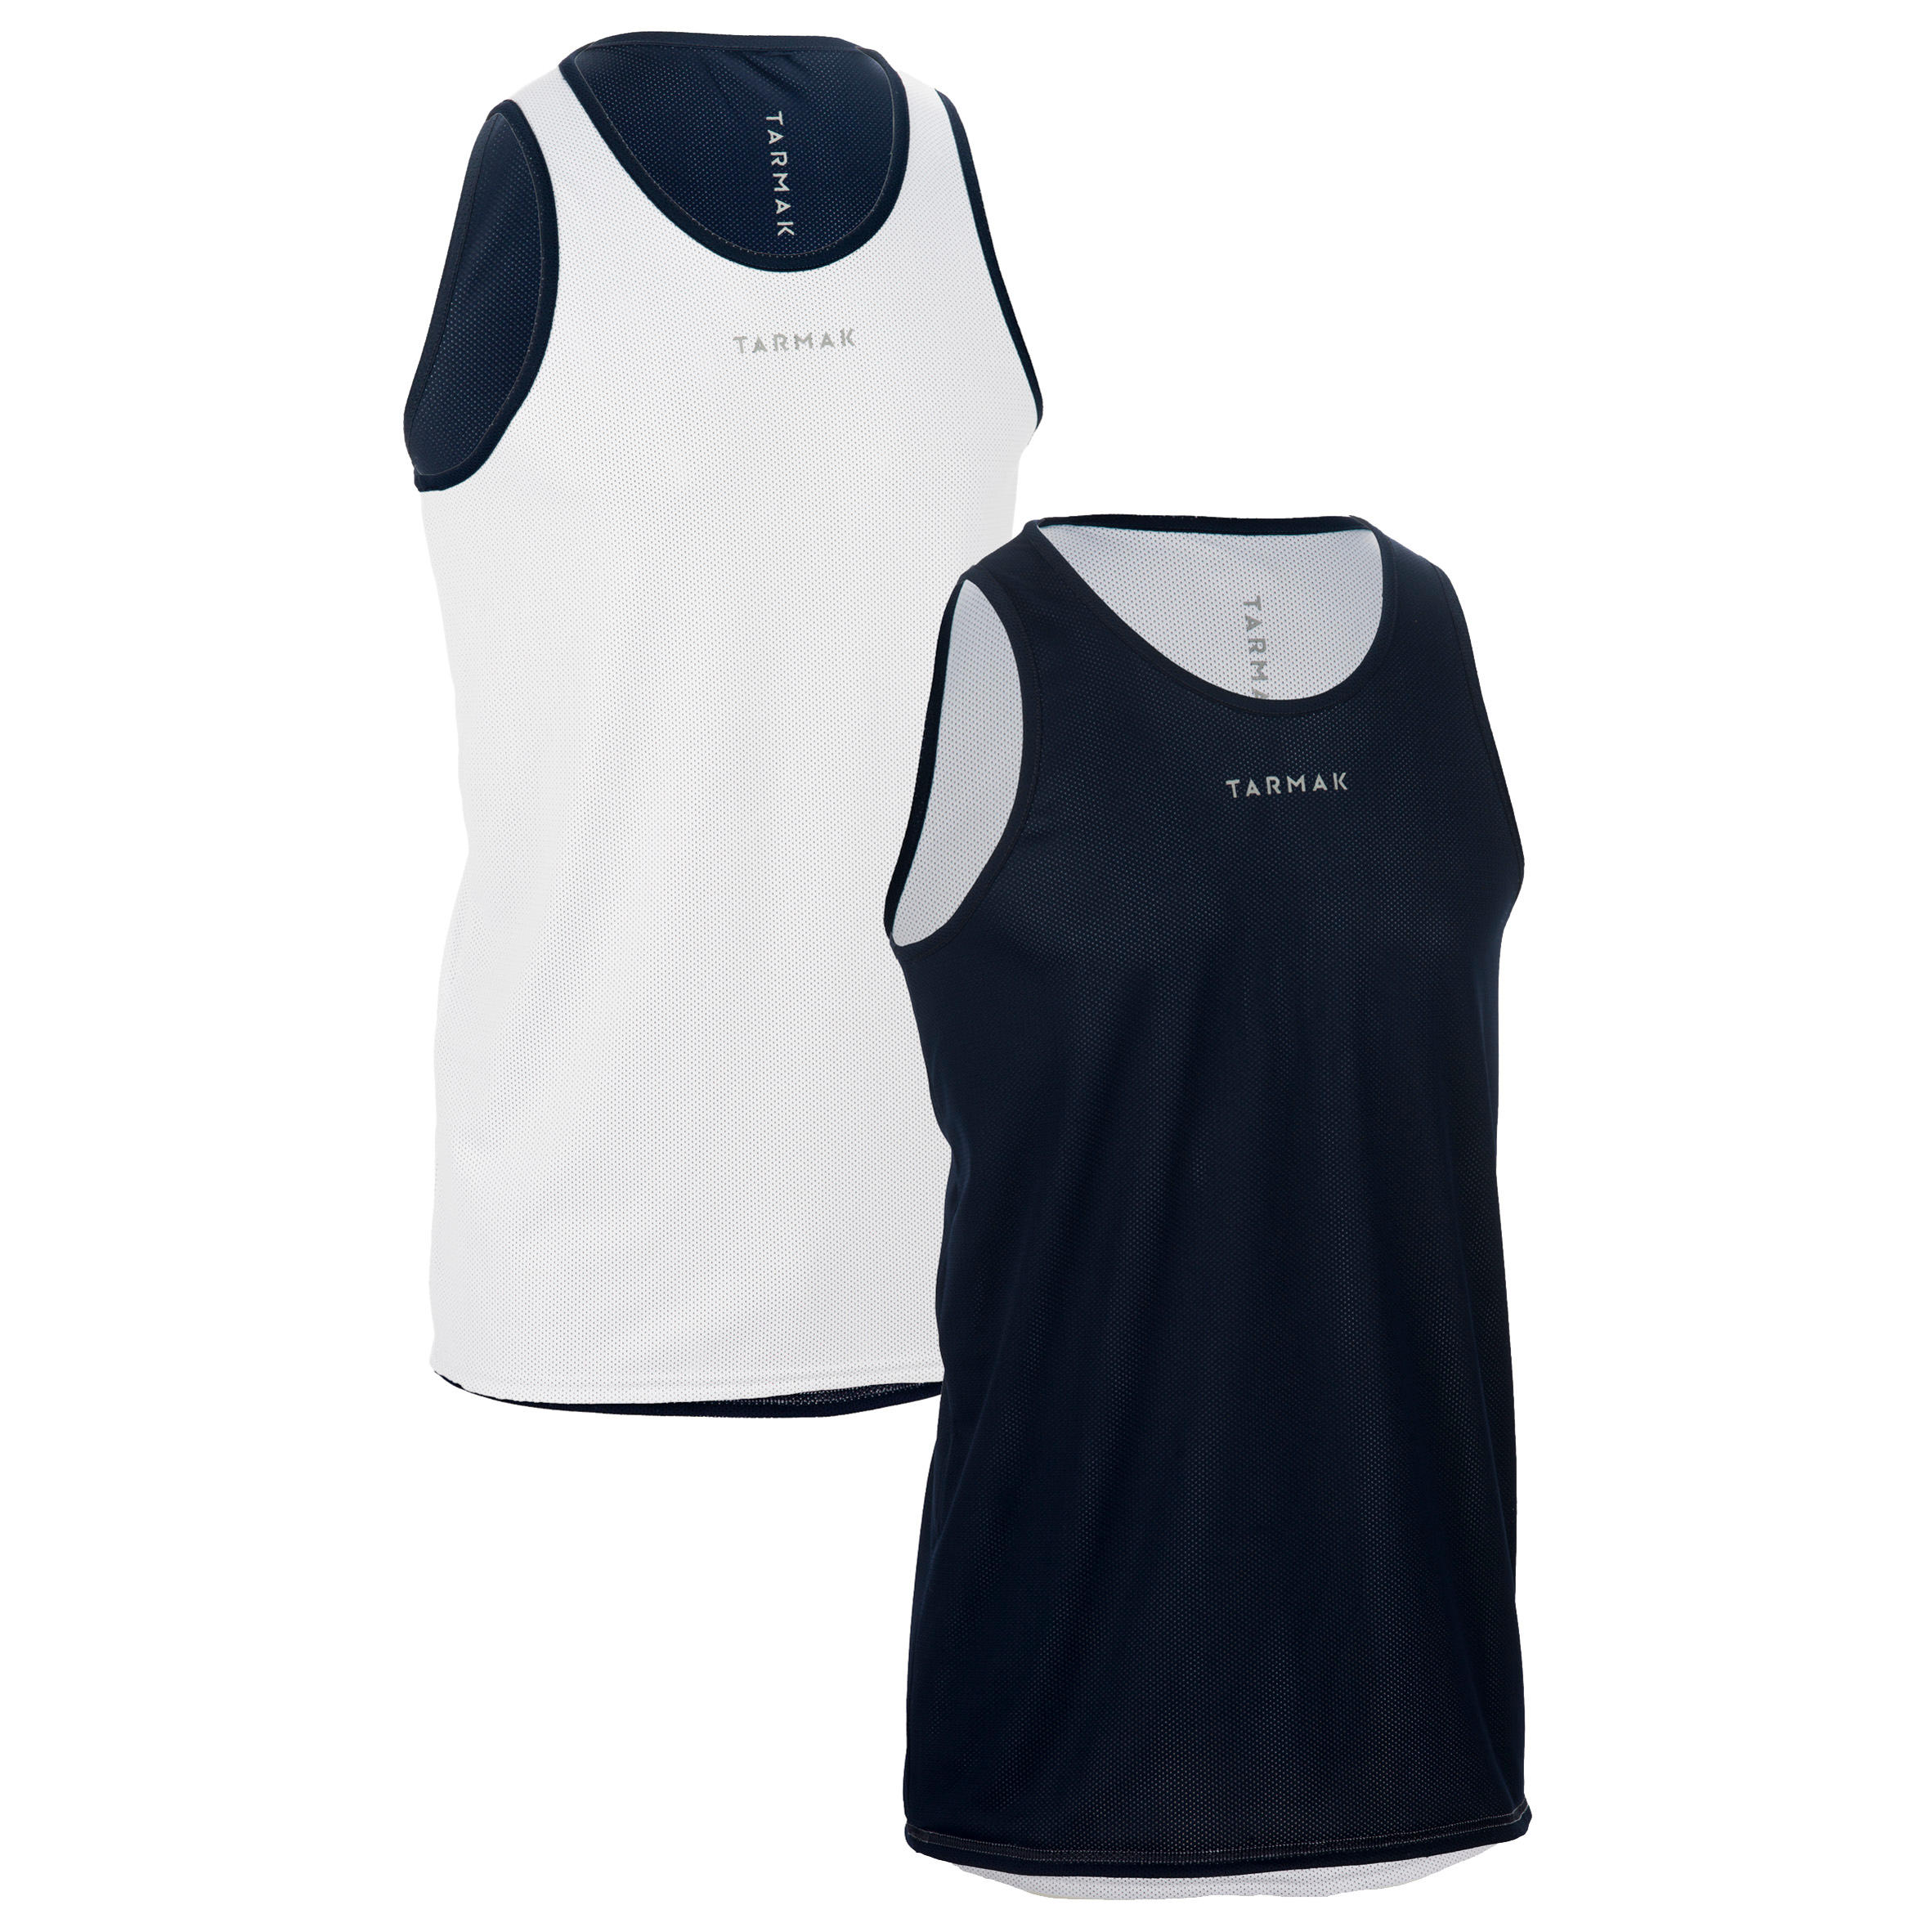 Men's Intermediate Reversible Basketball Tank Top - White/Blue